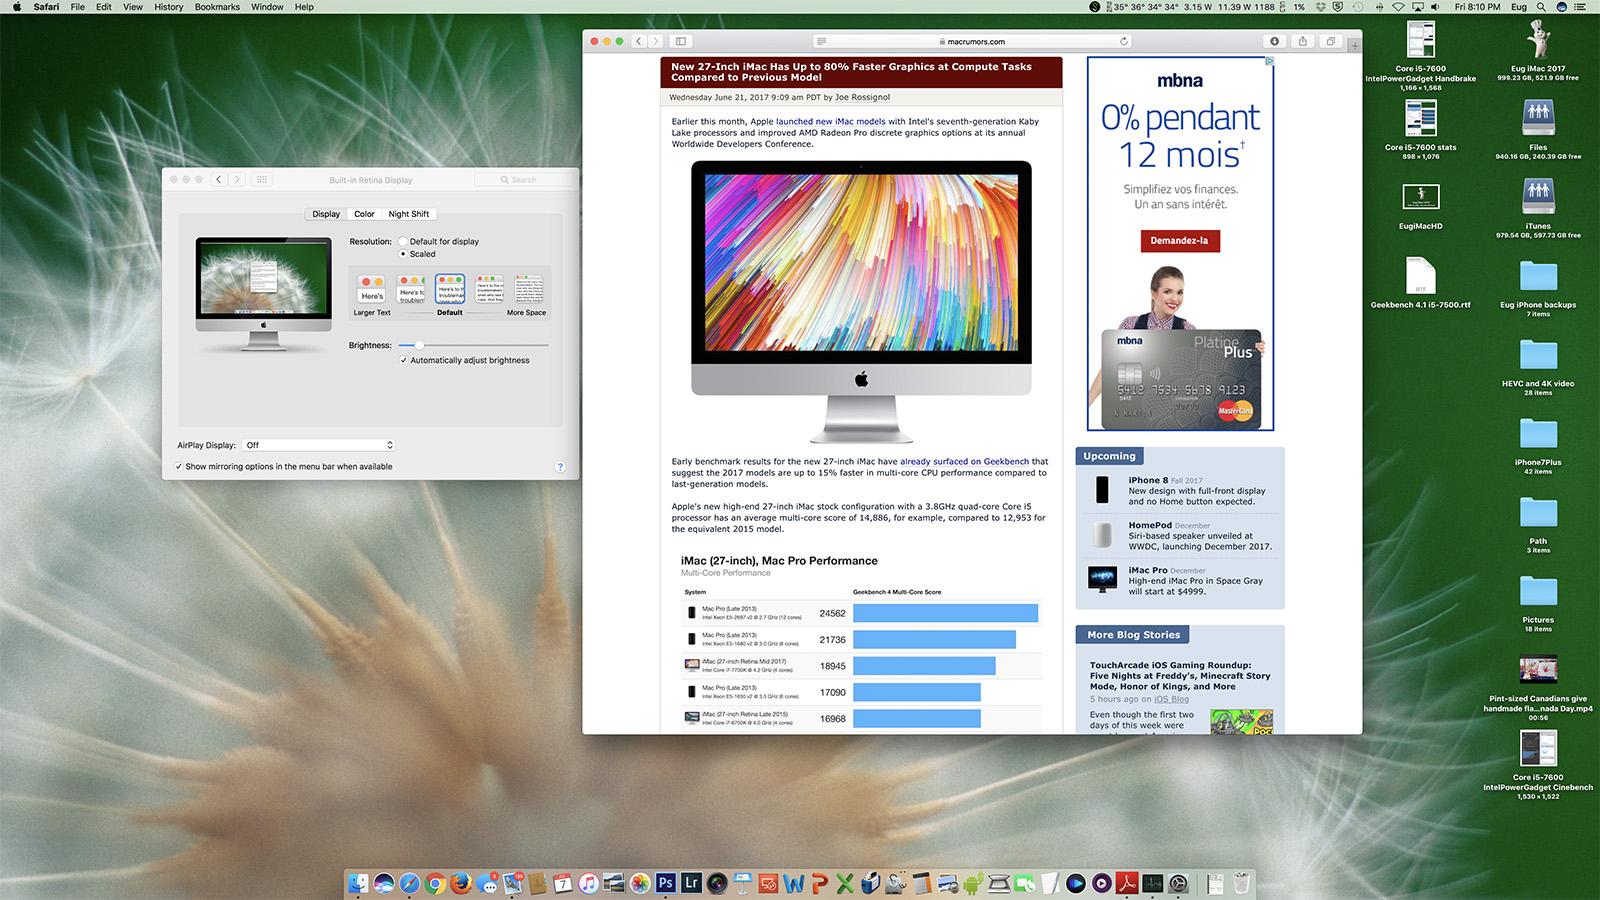 iMac_5120x2880_resized.jpg